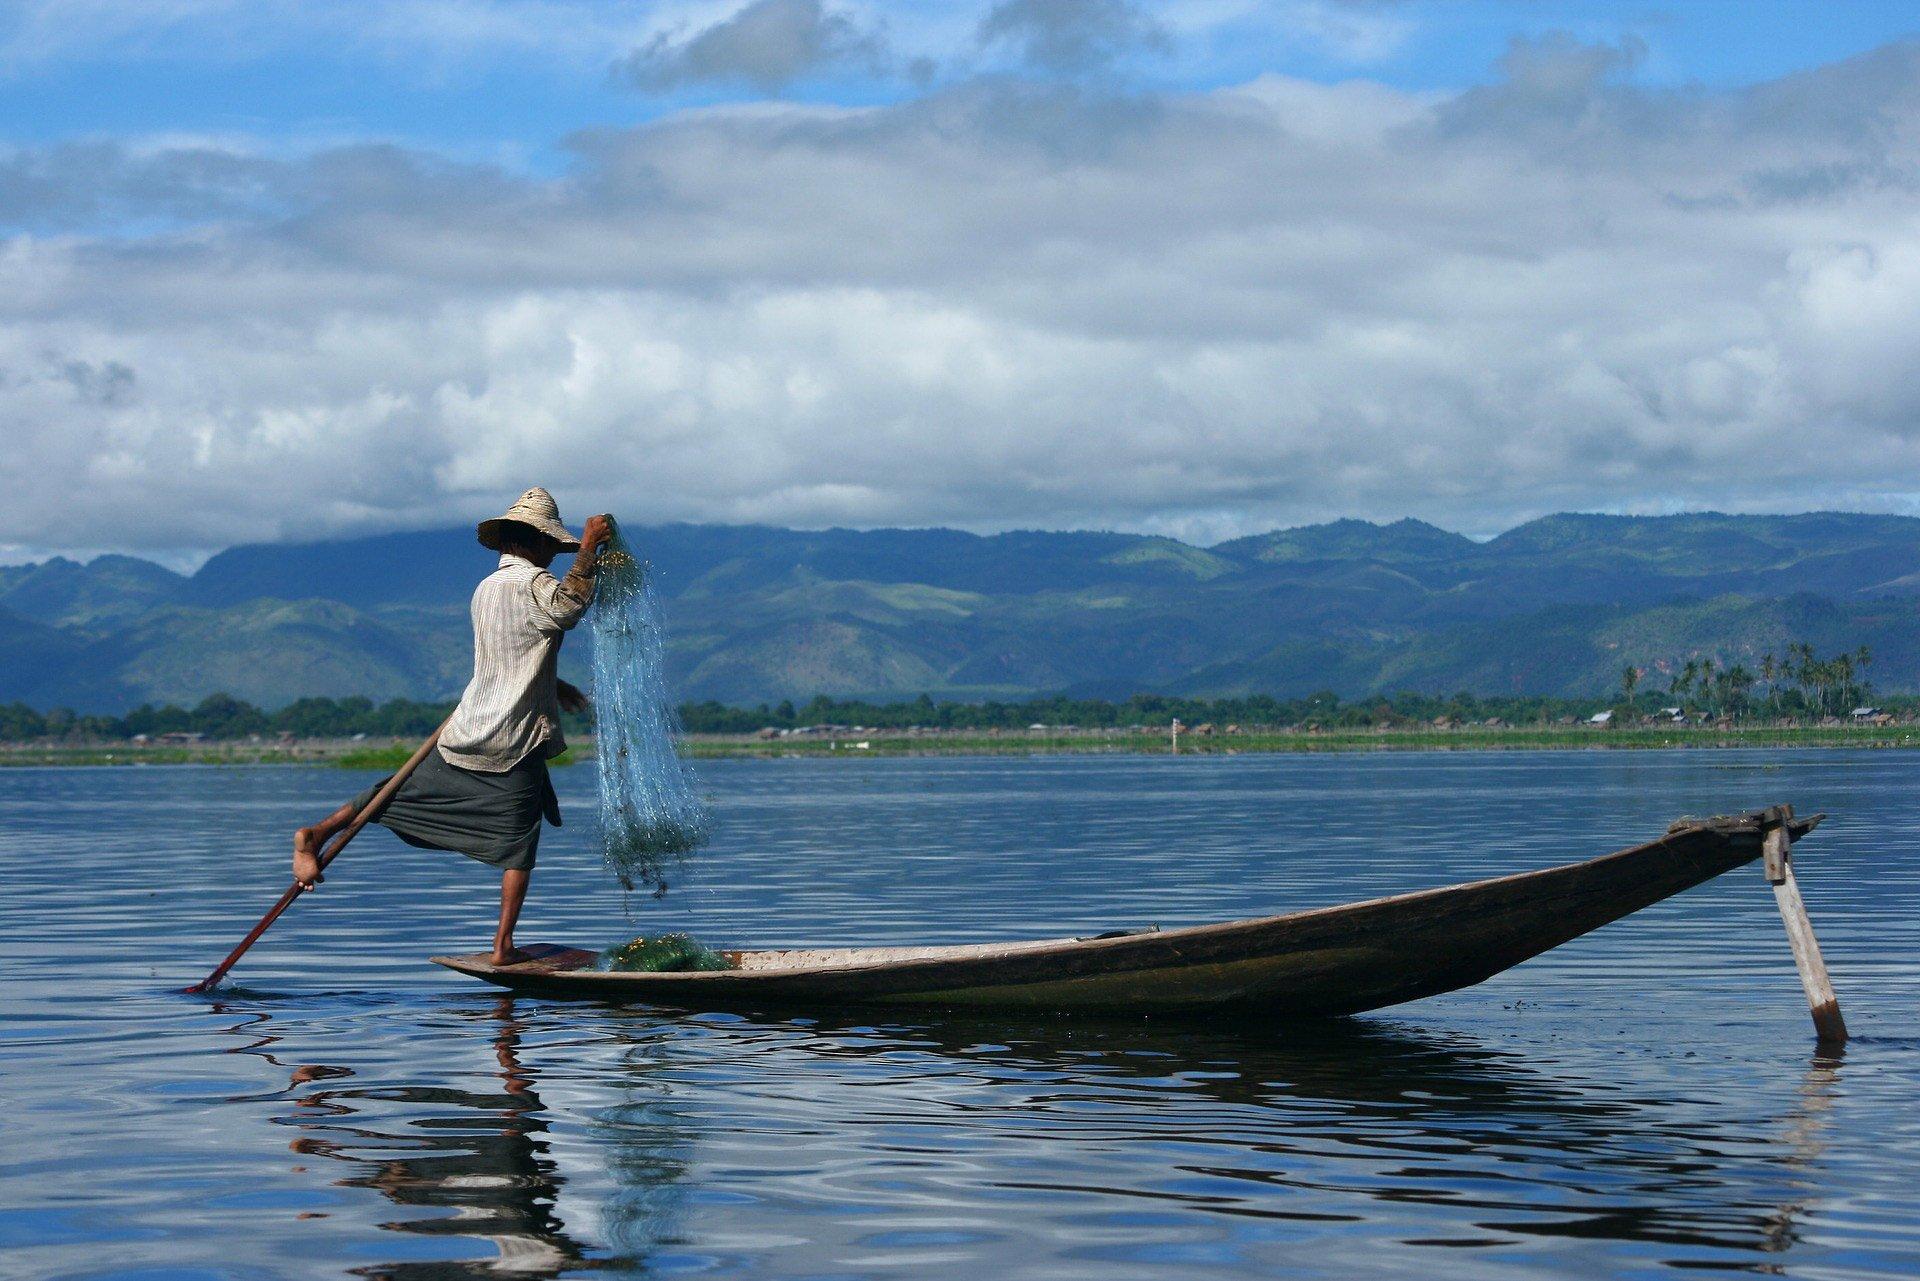 myanmar-travel-guide-7